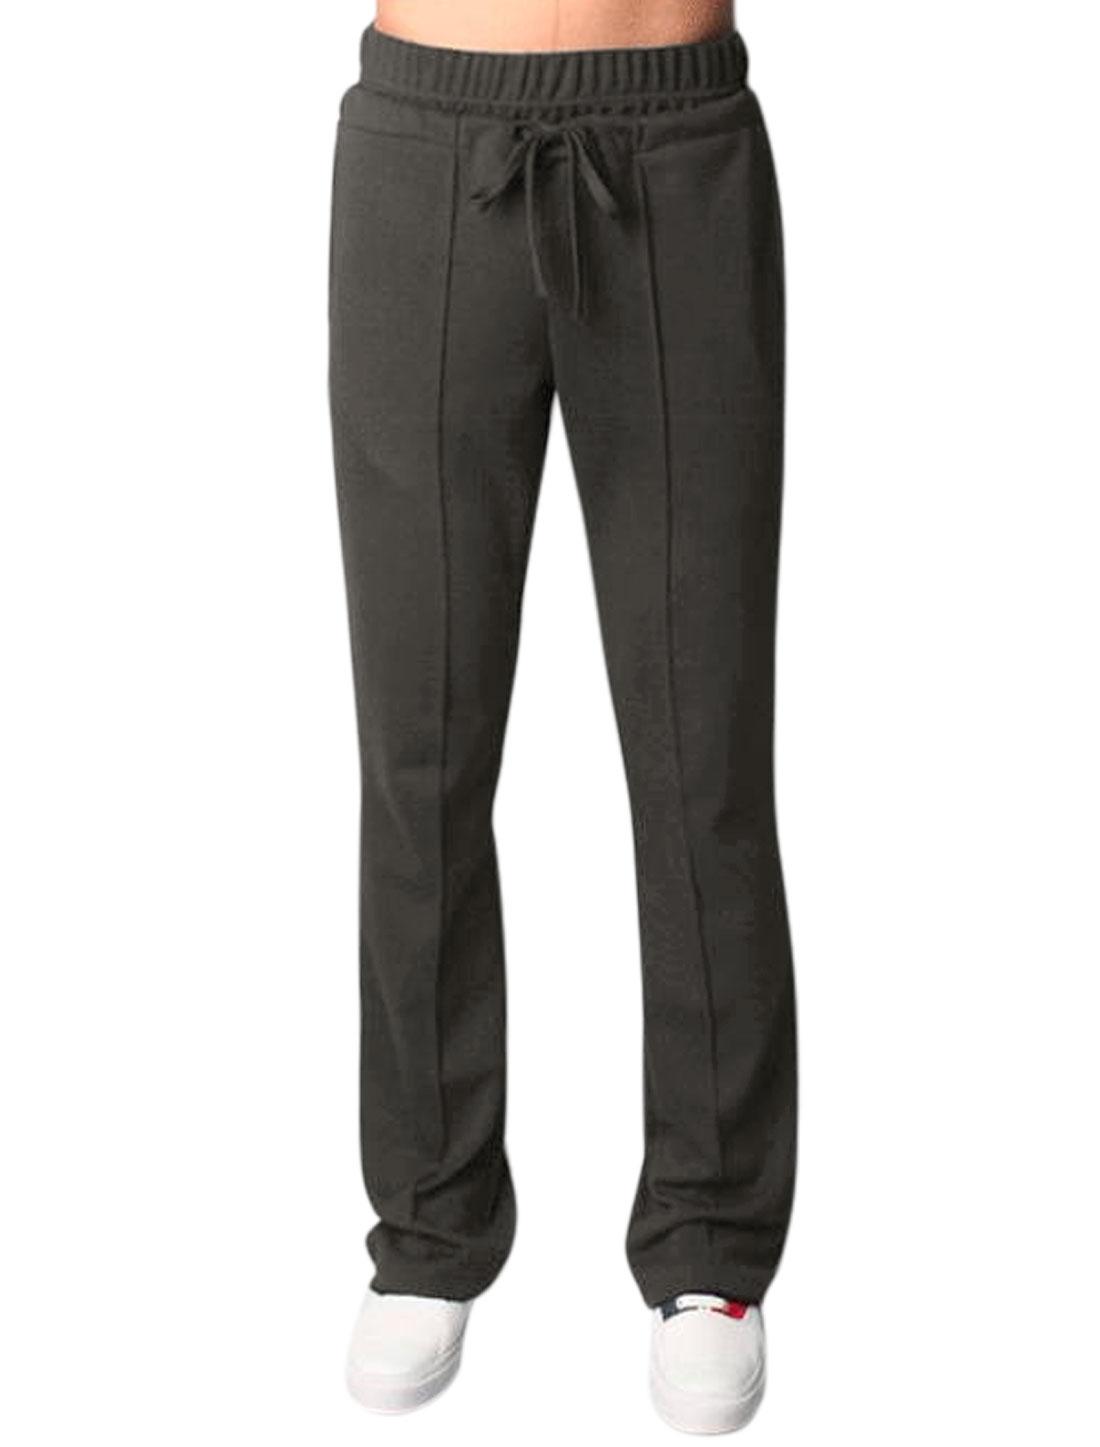 Men Drawstring Waist Decorative Seams Athletic Pants Gray S